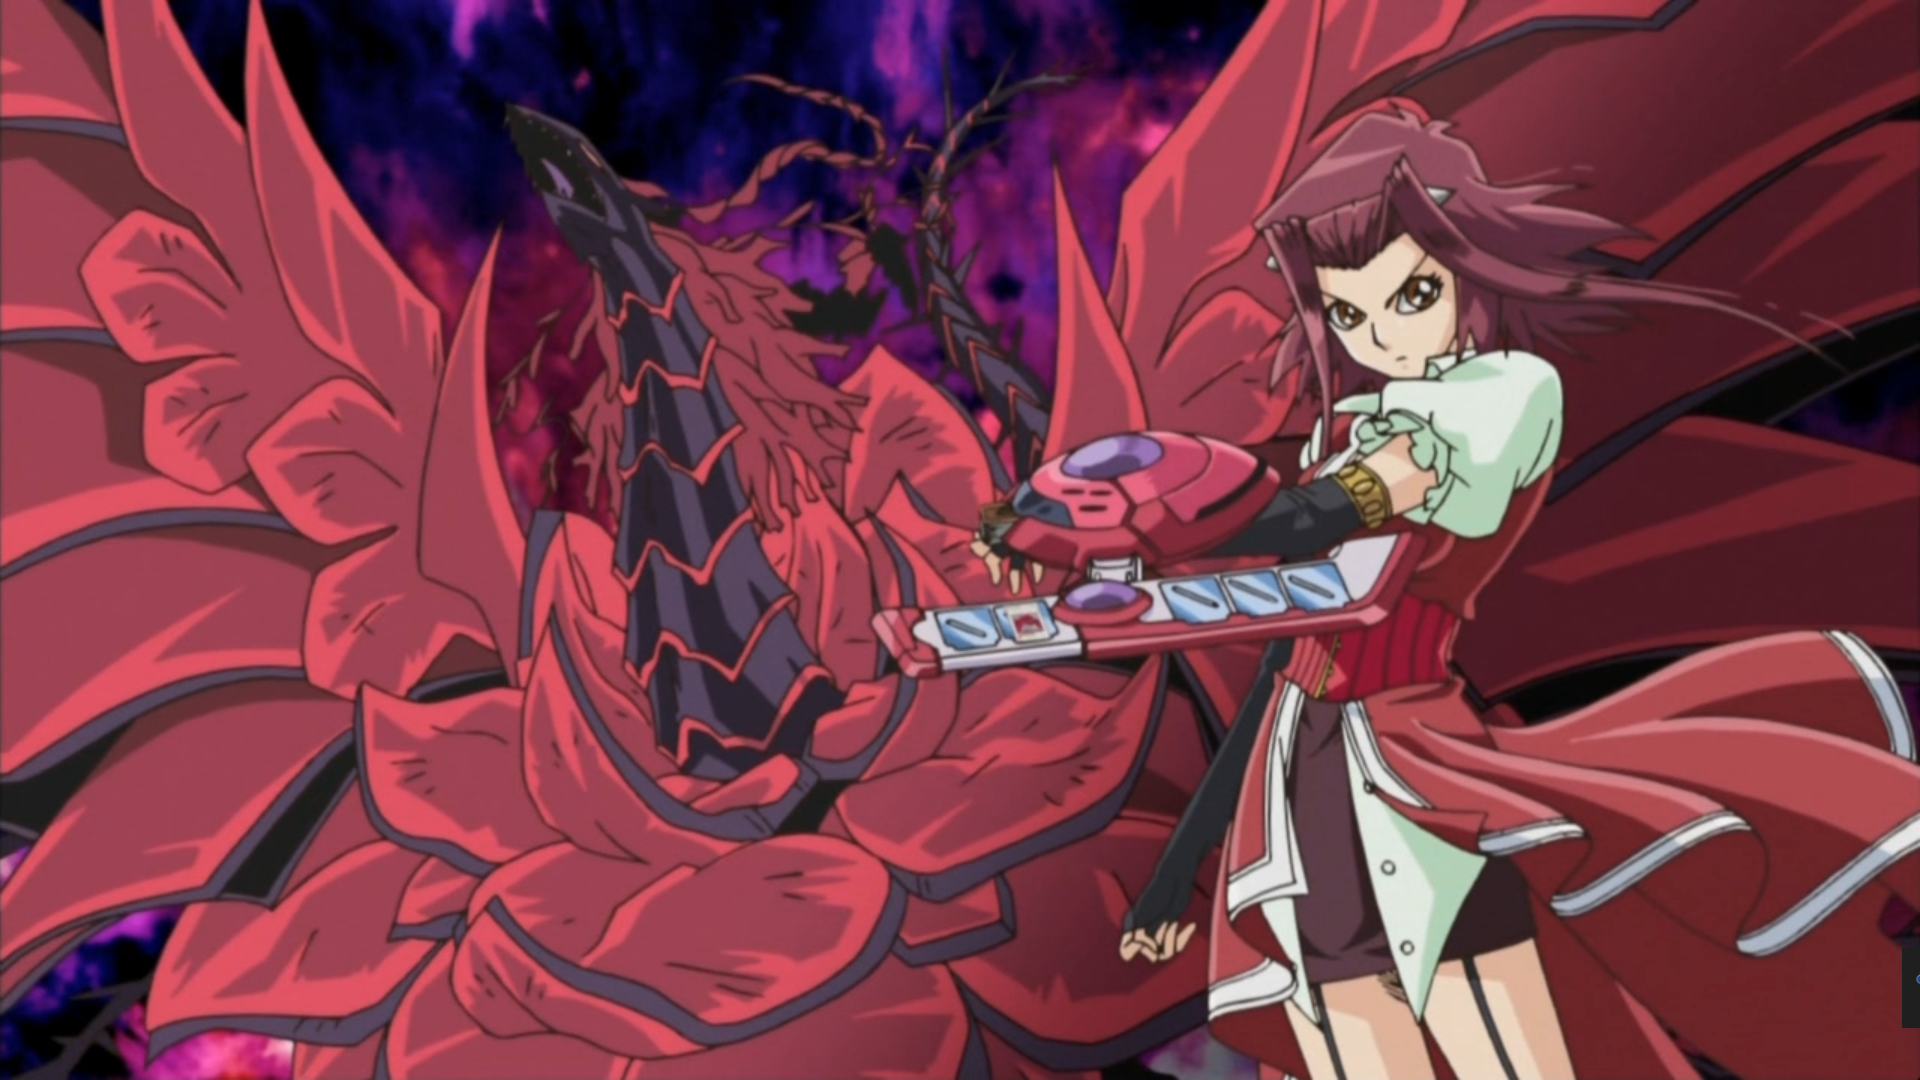 Akiza_Izinski and black rose dragon